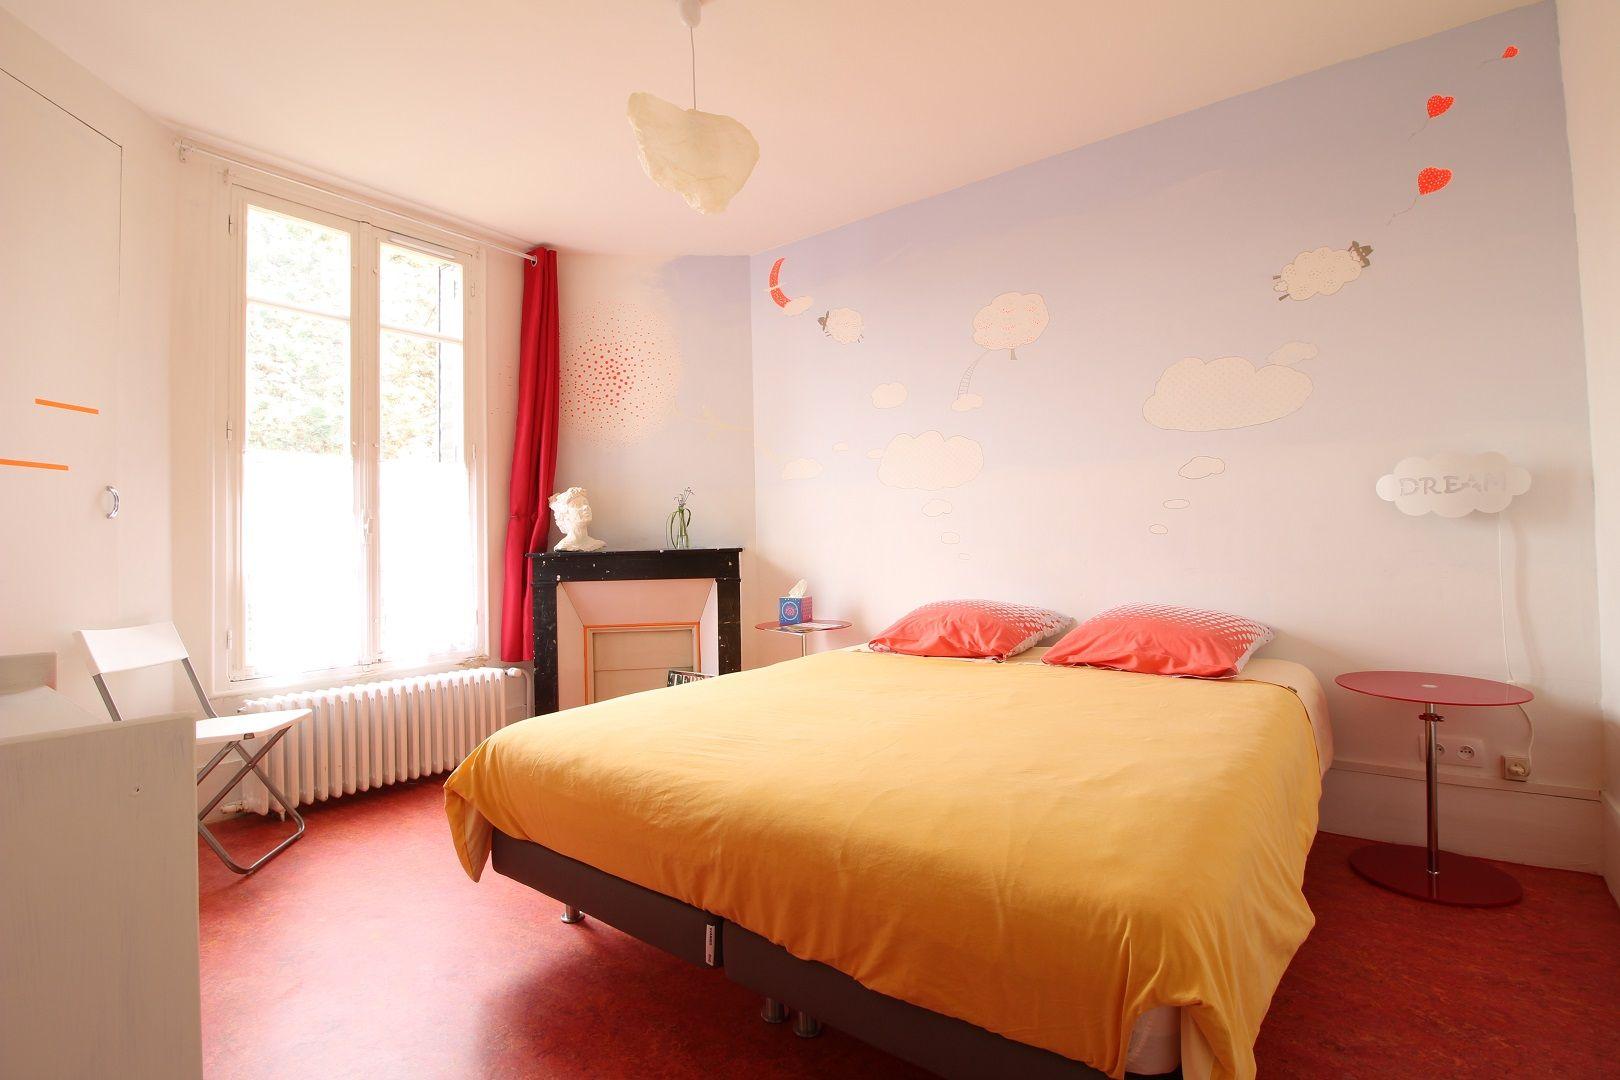 Piso de 2 habitaciones en Maisons-alfort